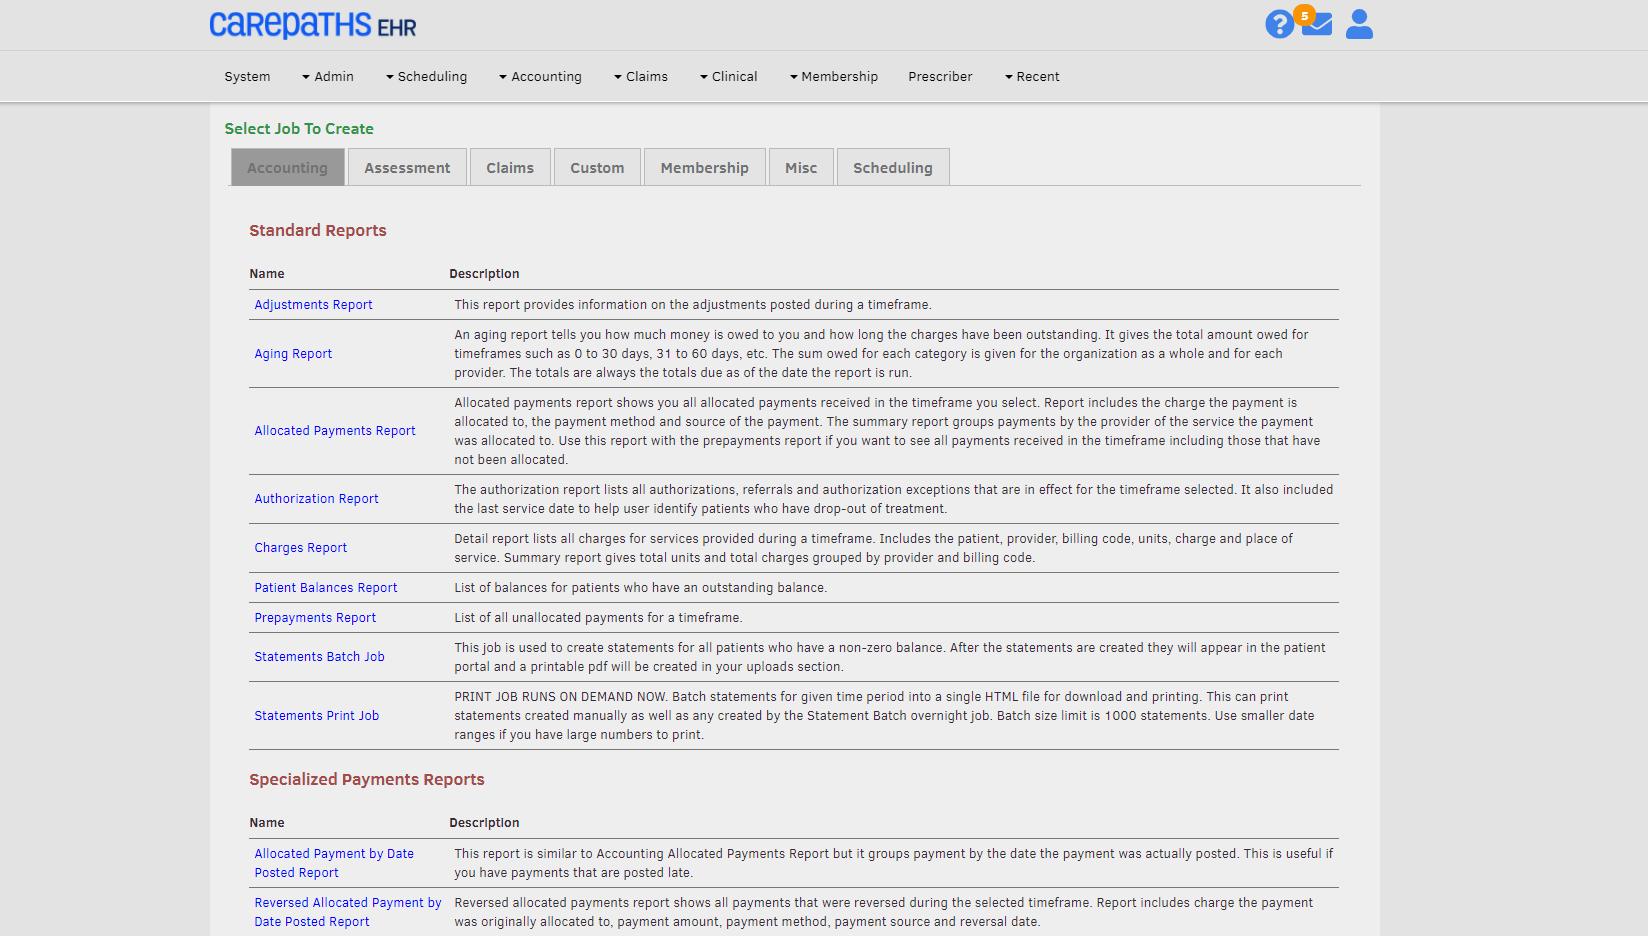 CarePaths EHR Software - Reporting Portal